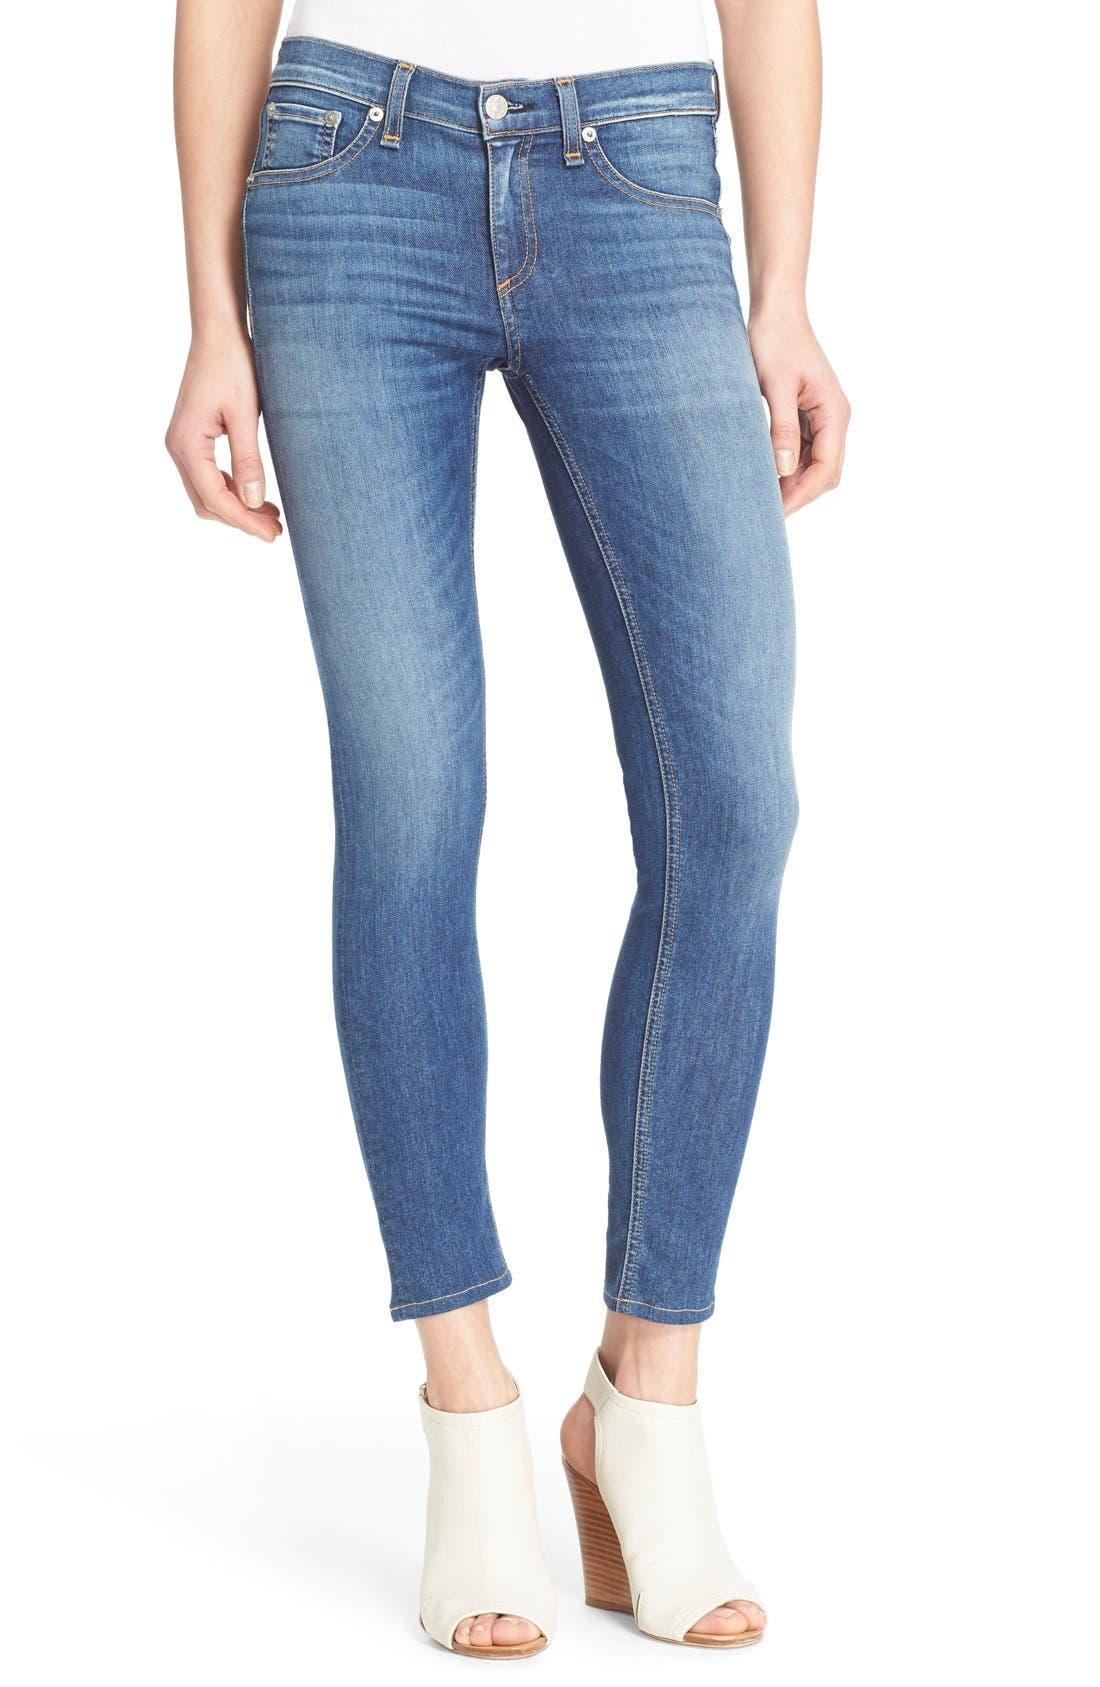 Skinny cropped denim jeans